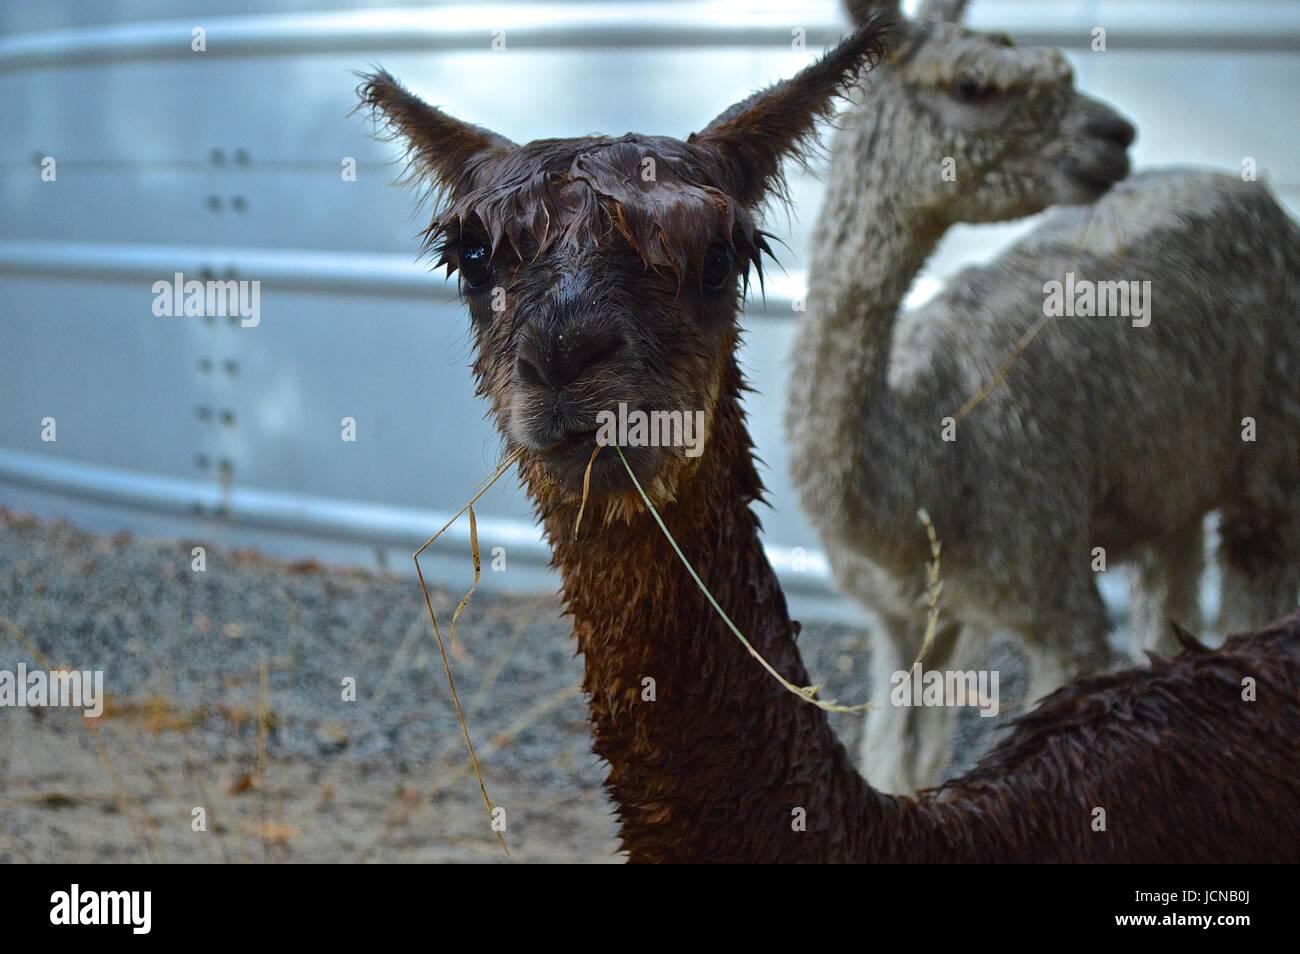 Nassen Alpaka mit Rasen in den Mund Stockbild